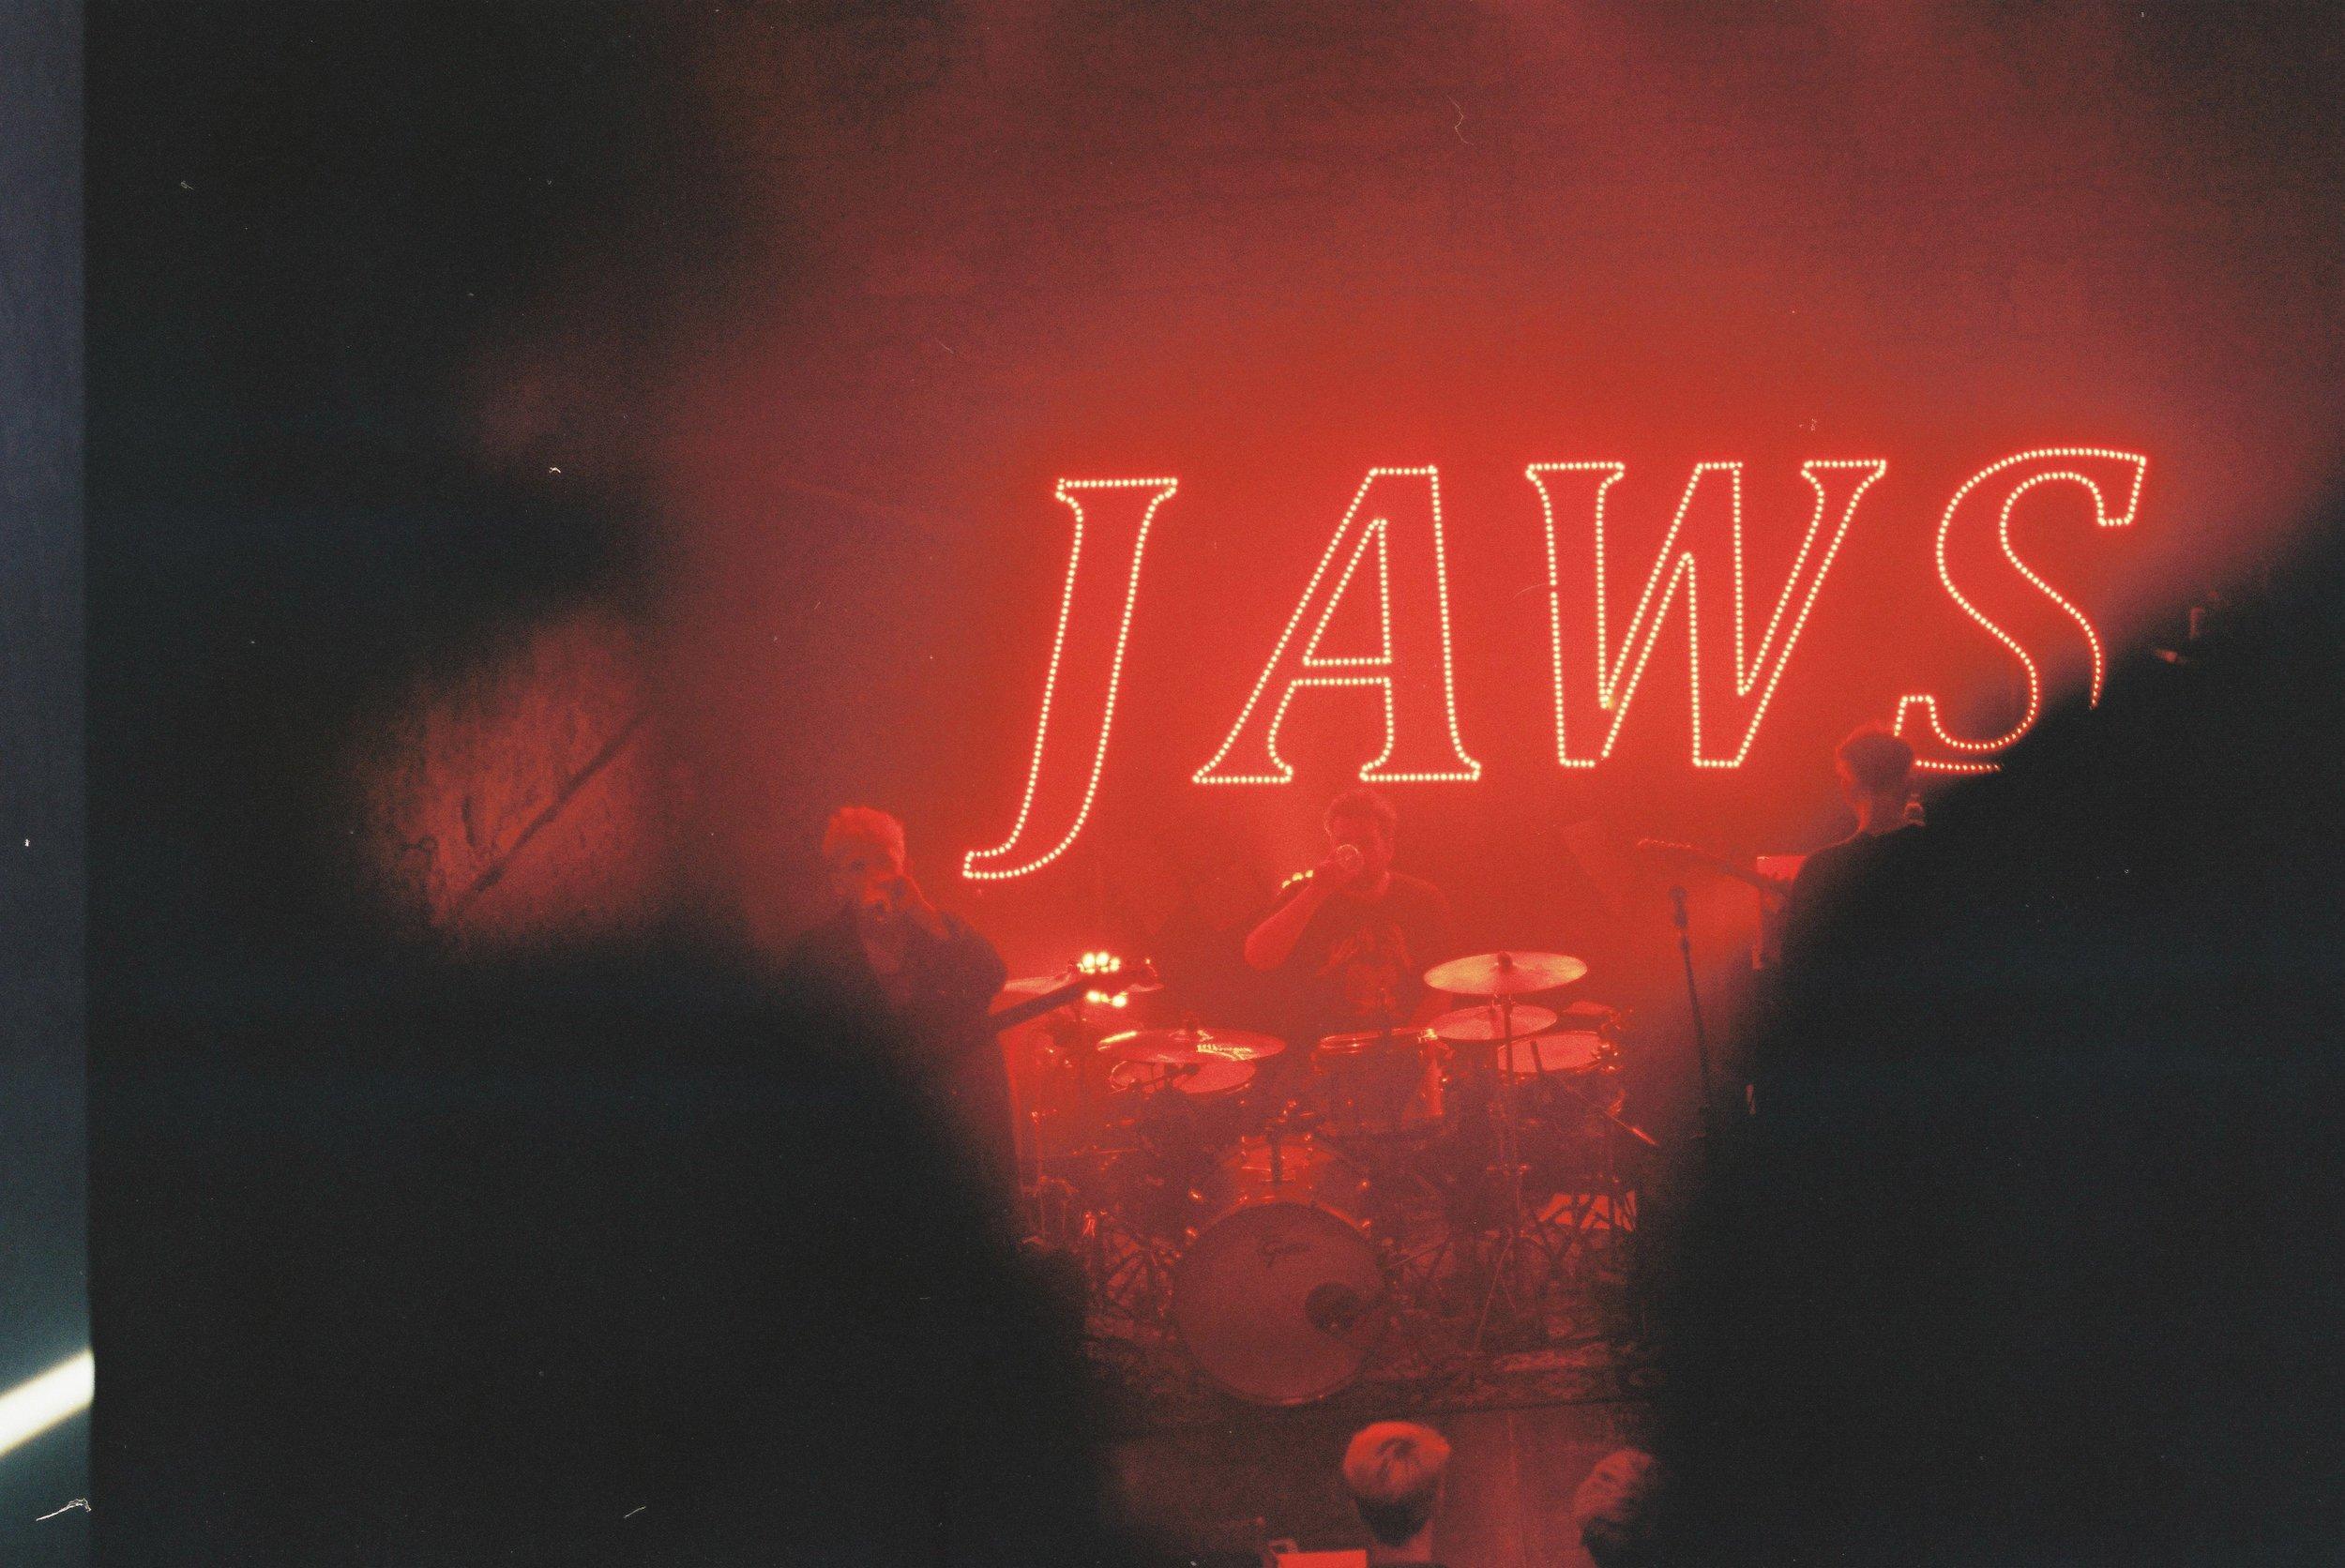 20171127 JAWS The Caves EDI 57.JPG